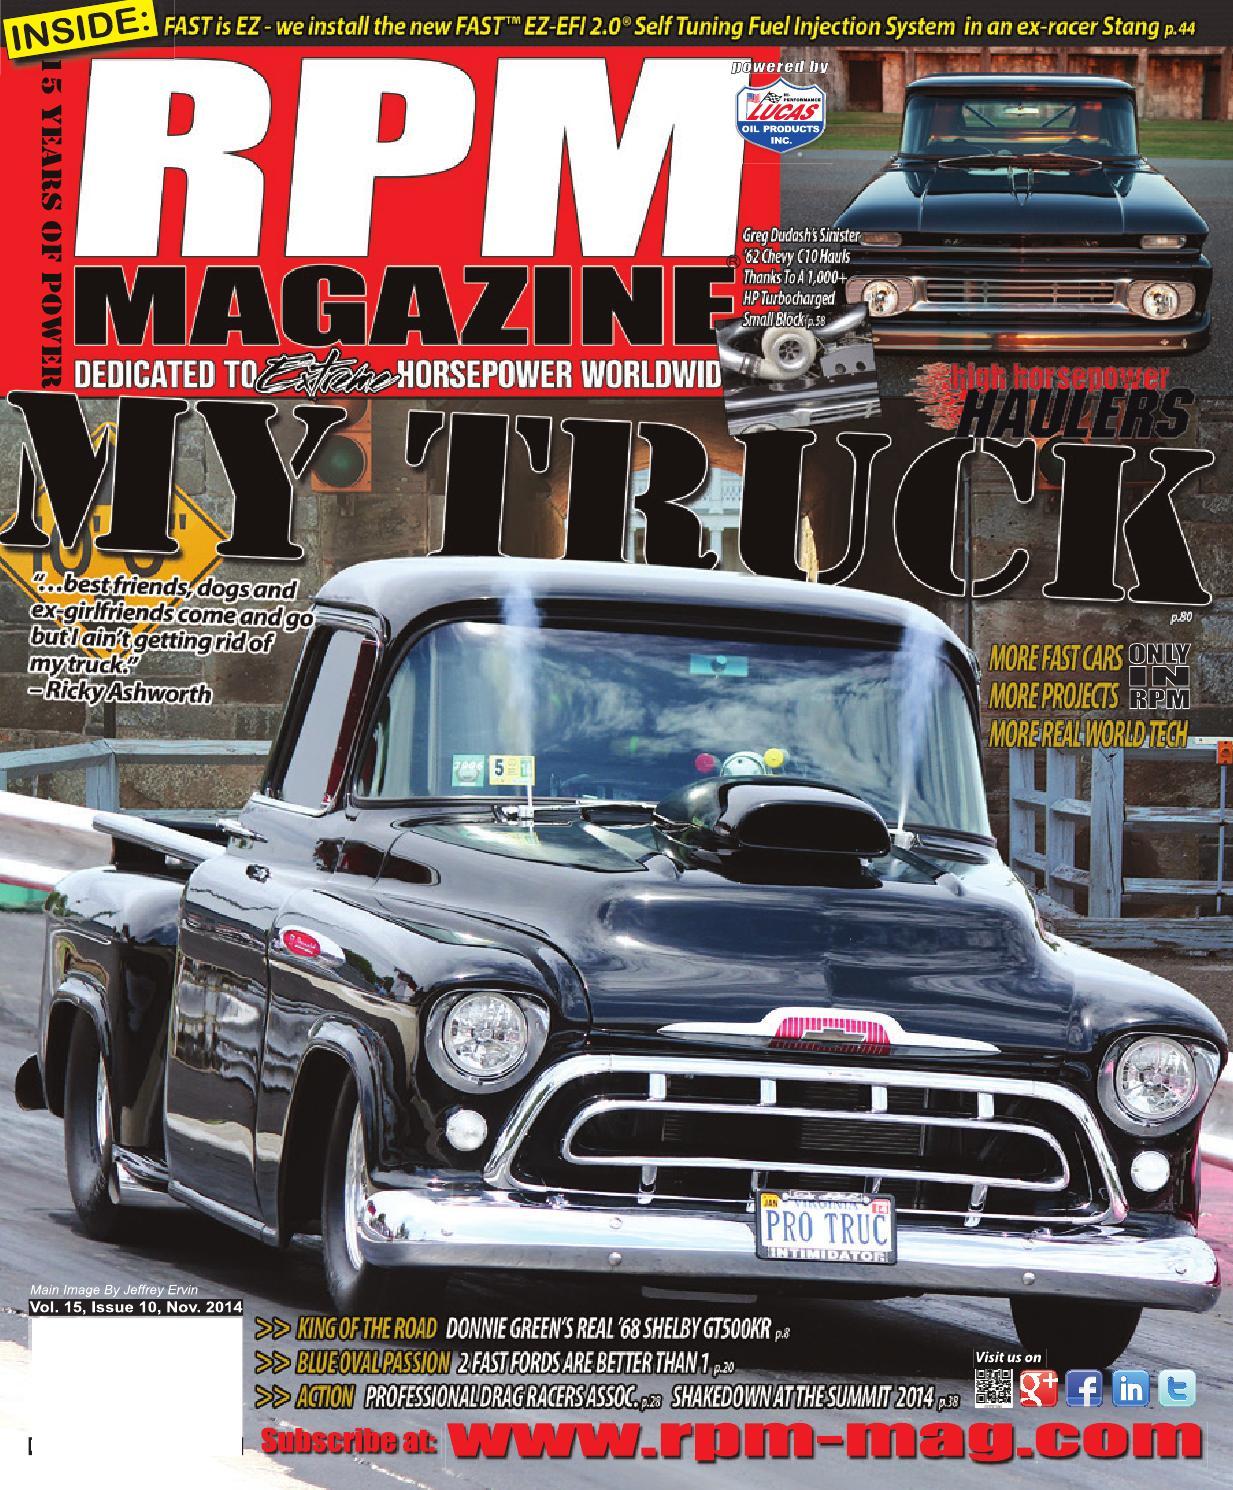 Rpm Magazine November Issue 2014 By Issuu Tail Lights Trailer Set Truck Ford Rv Semi Angle W Wiring Plug Ebay